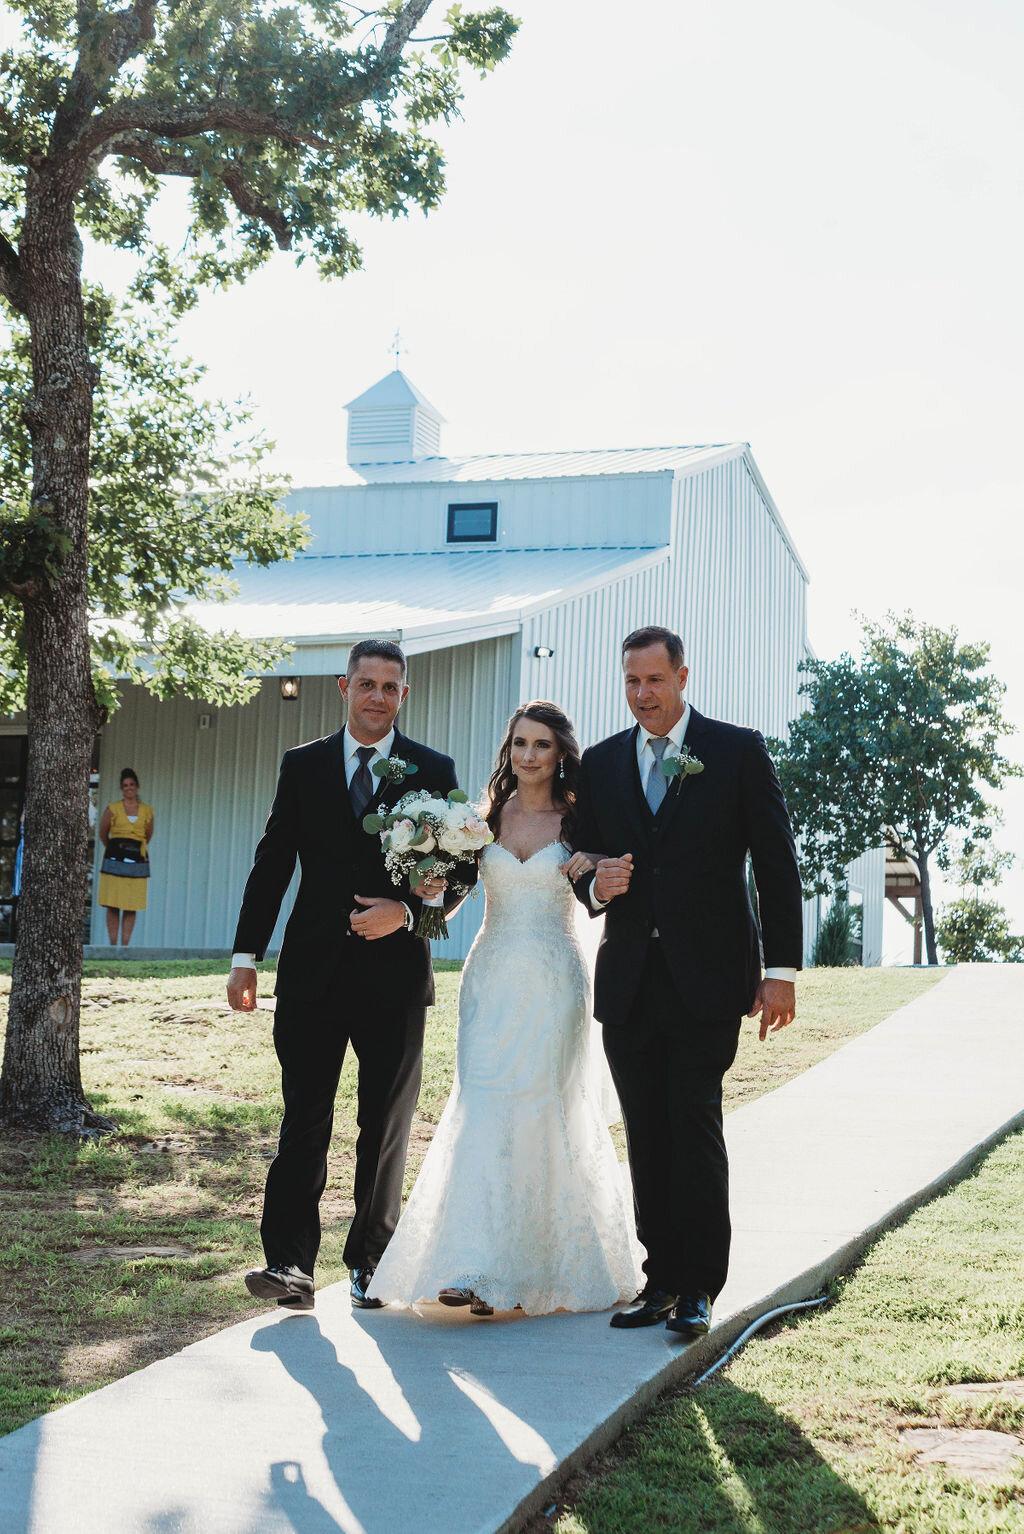 Tulsa Wedding Venue with a View 27.jpg